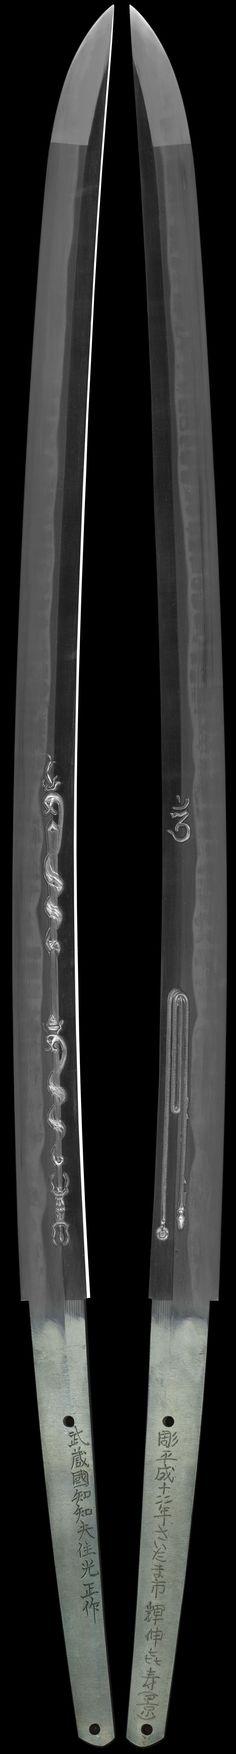 Katana Chichibu Ji Mitsumasa Japanese Blades, Japanese Sword, Swords And Daggers, Knives And Swords, The Razors Edge, Samurai Swords Katana, Martial Arts Weapons, Art Of Fighting, Japanese Warrior